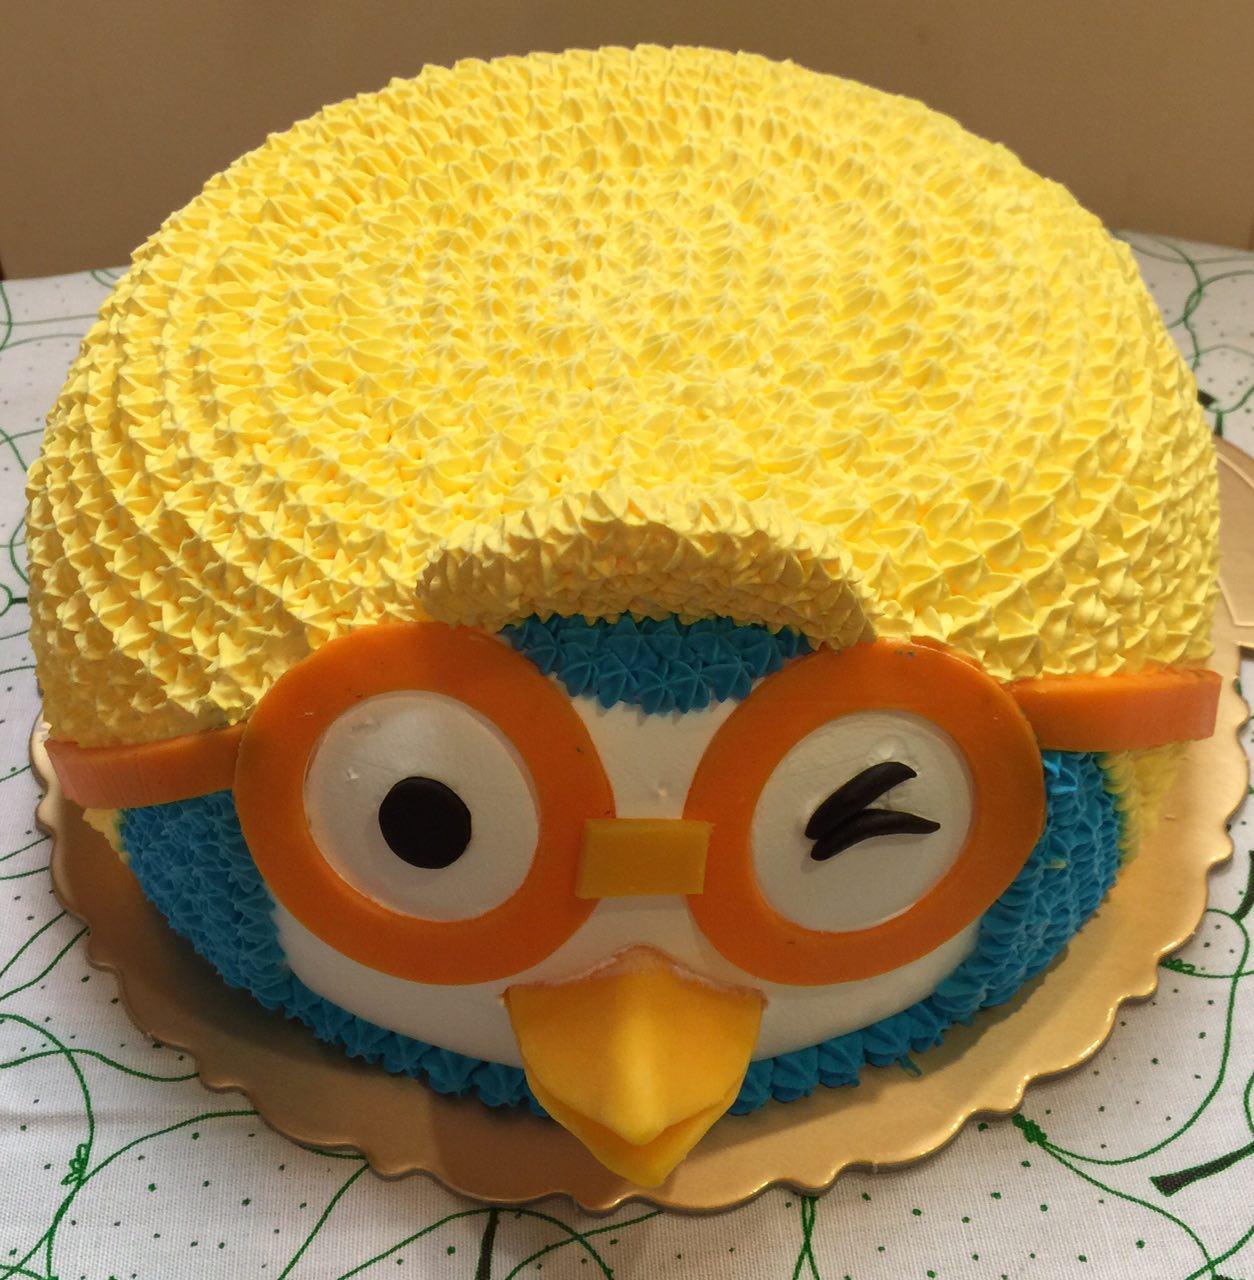 Pororo 3D Cake